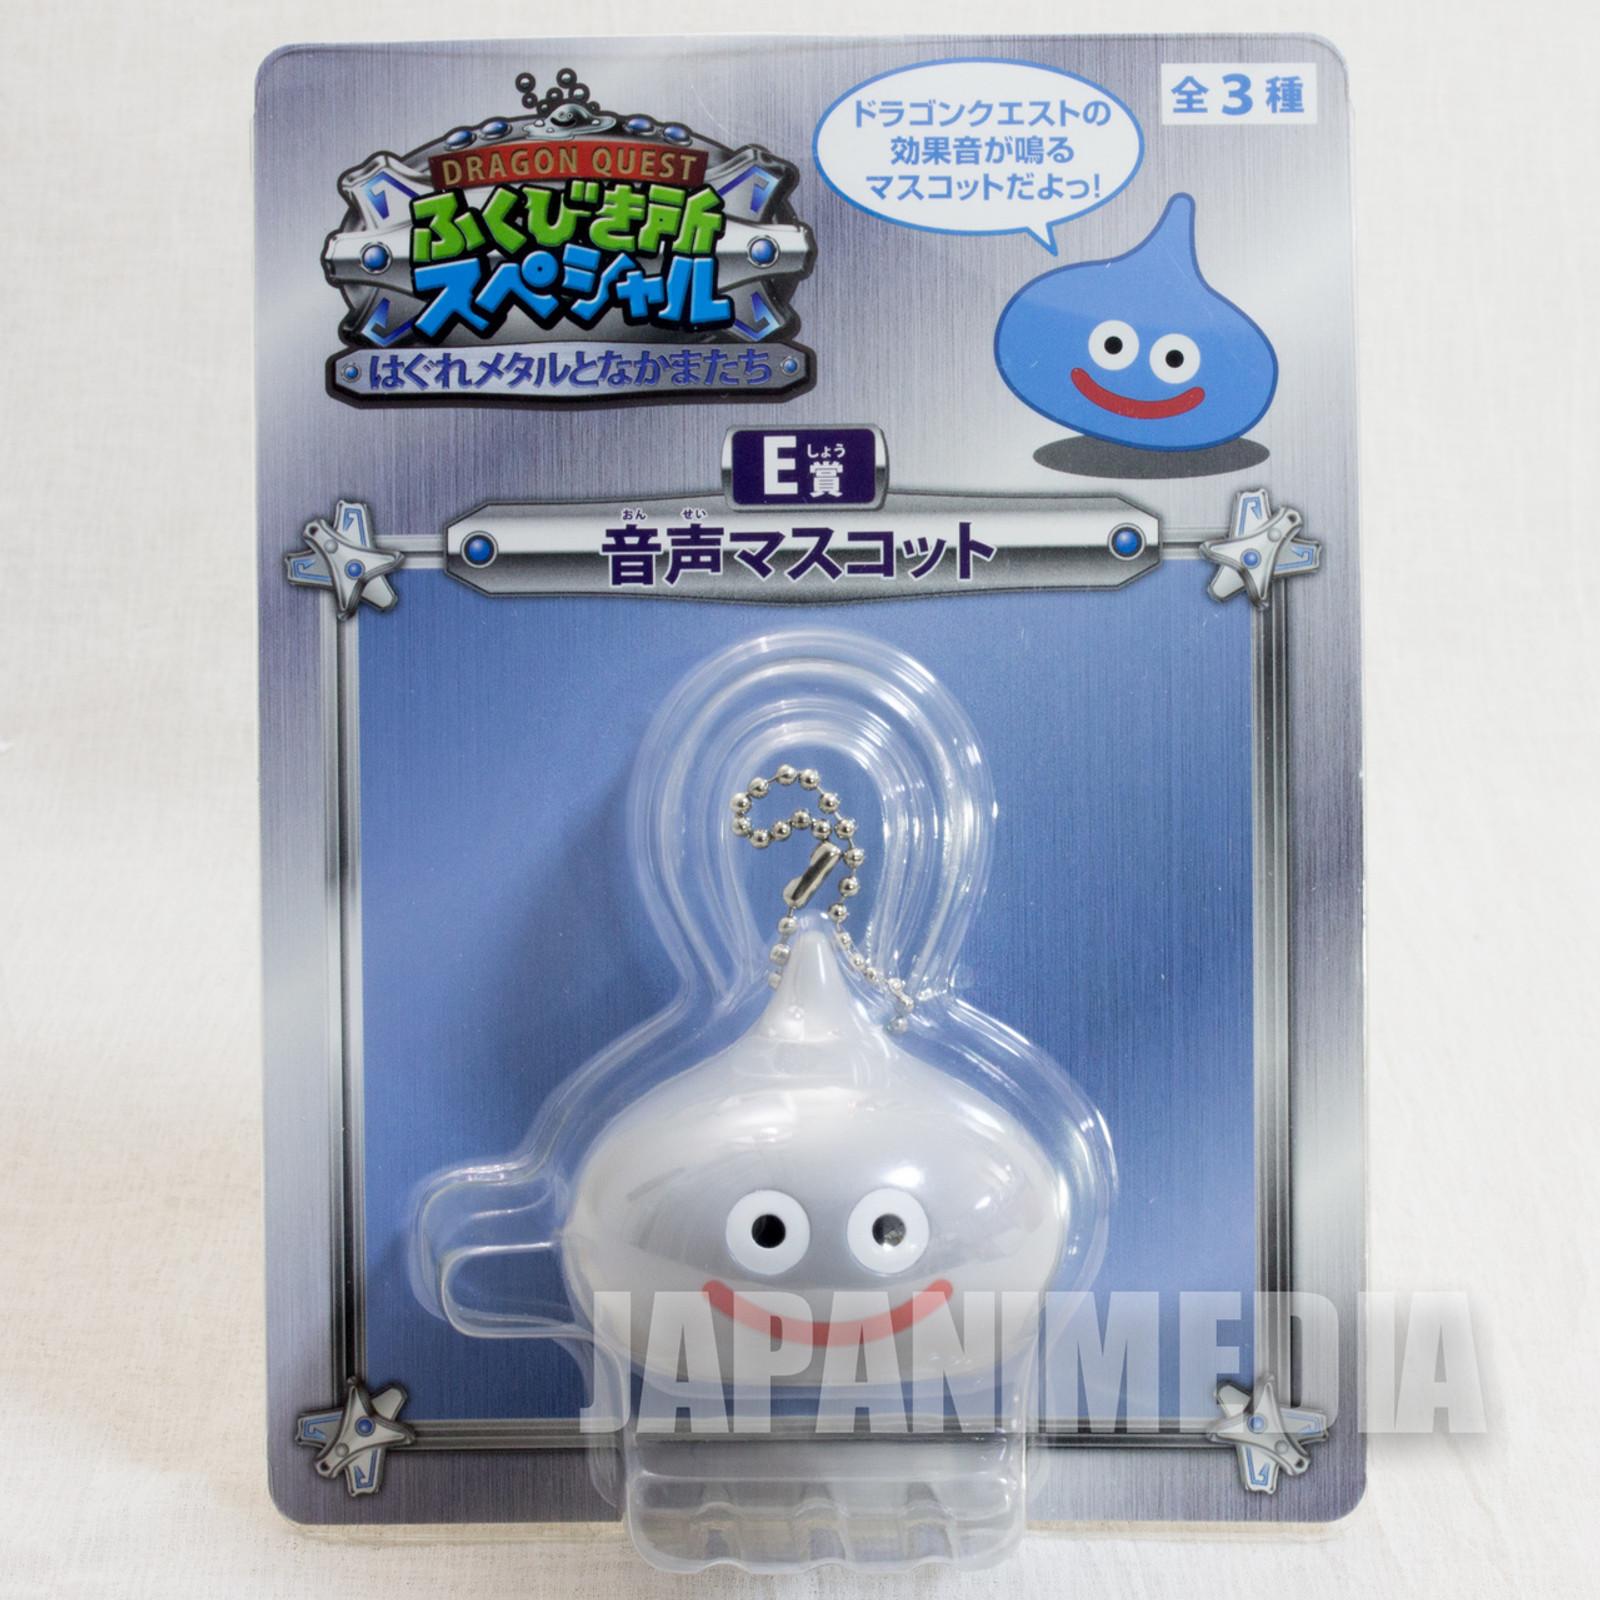 Dragon Quest Monste Metal Slime Game SE Sound Figure Ballchain JAPAN WARRIOR